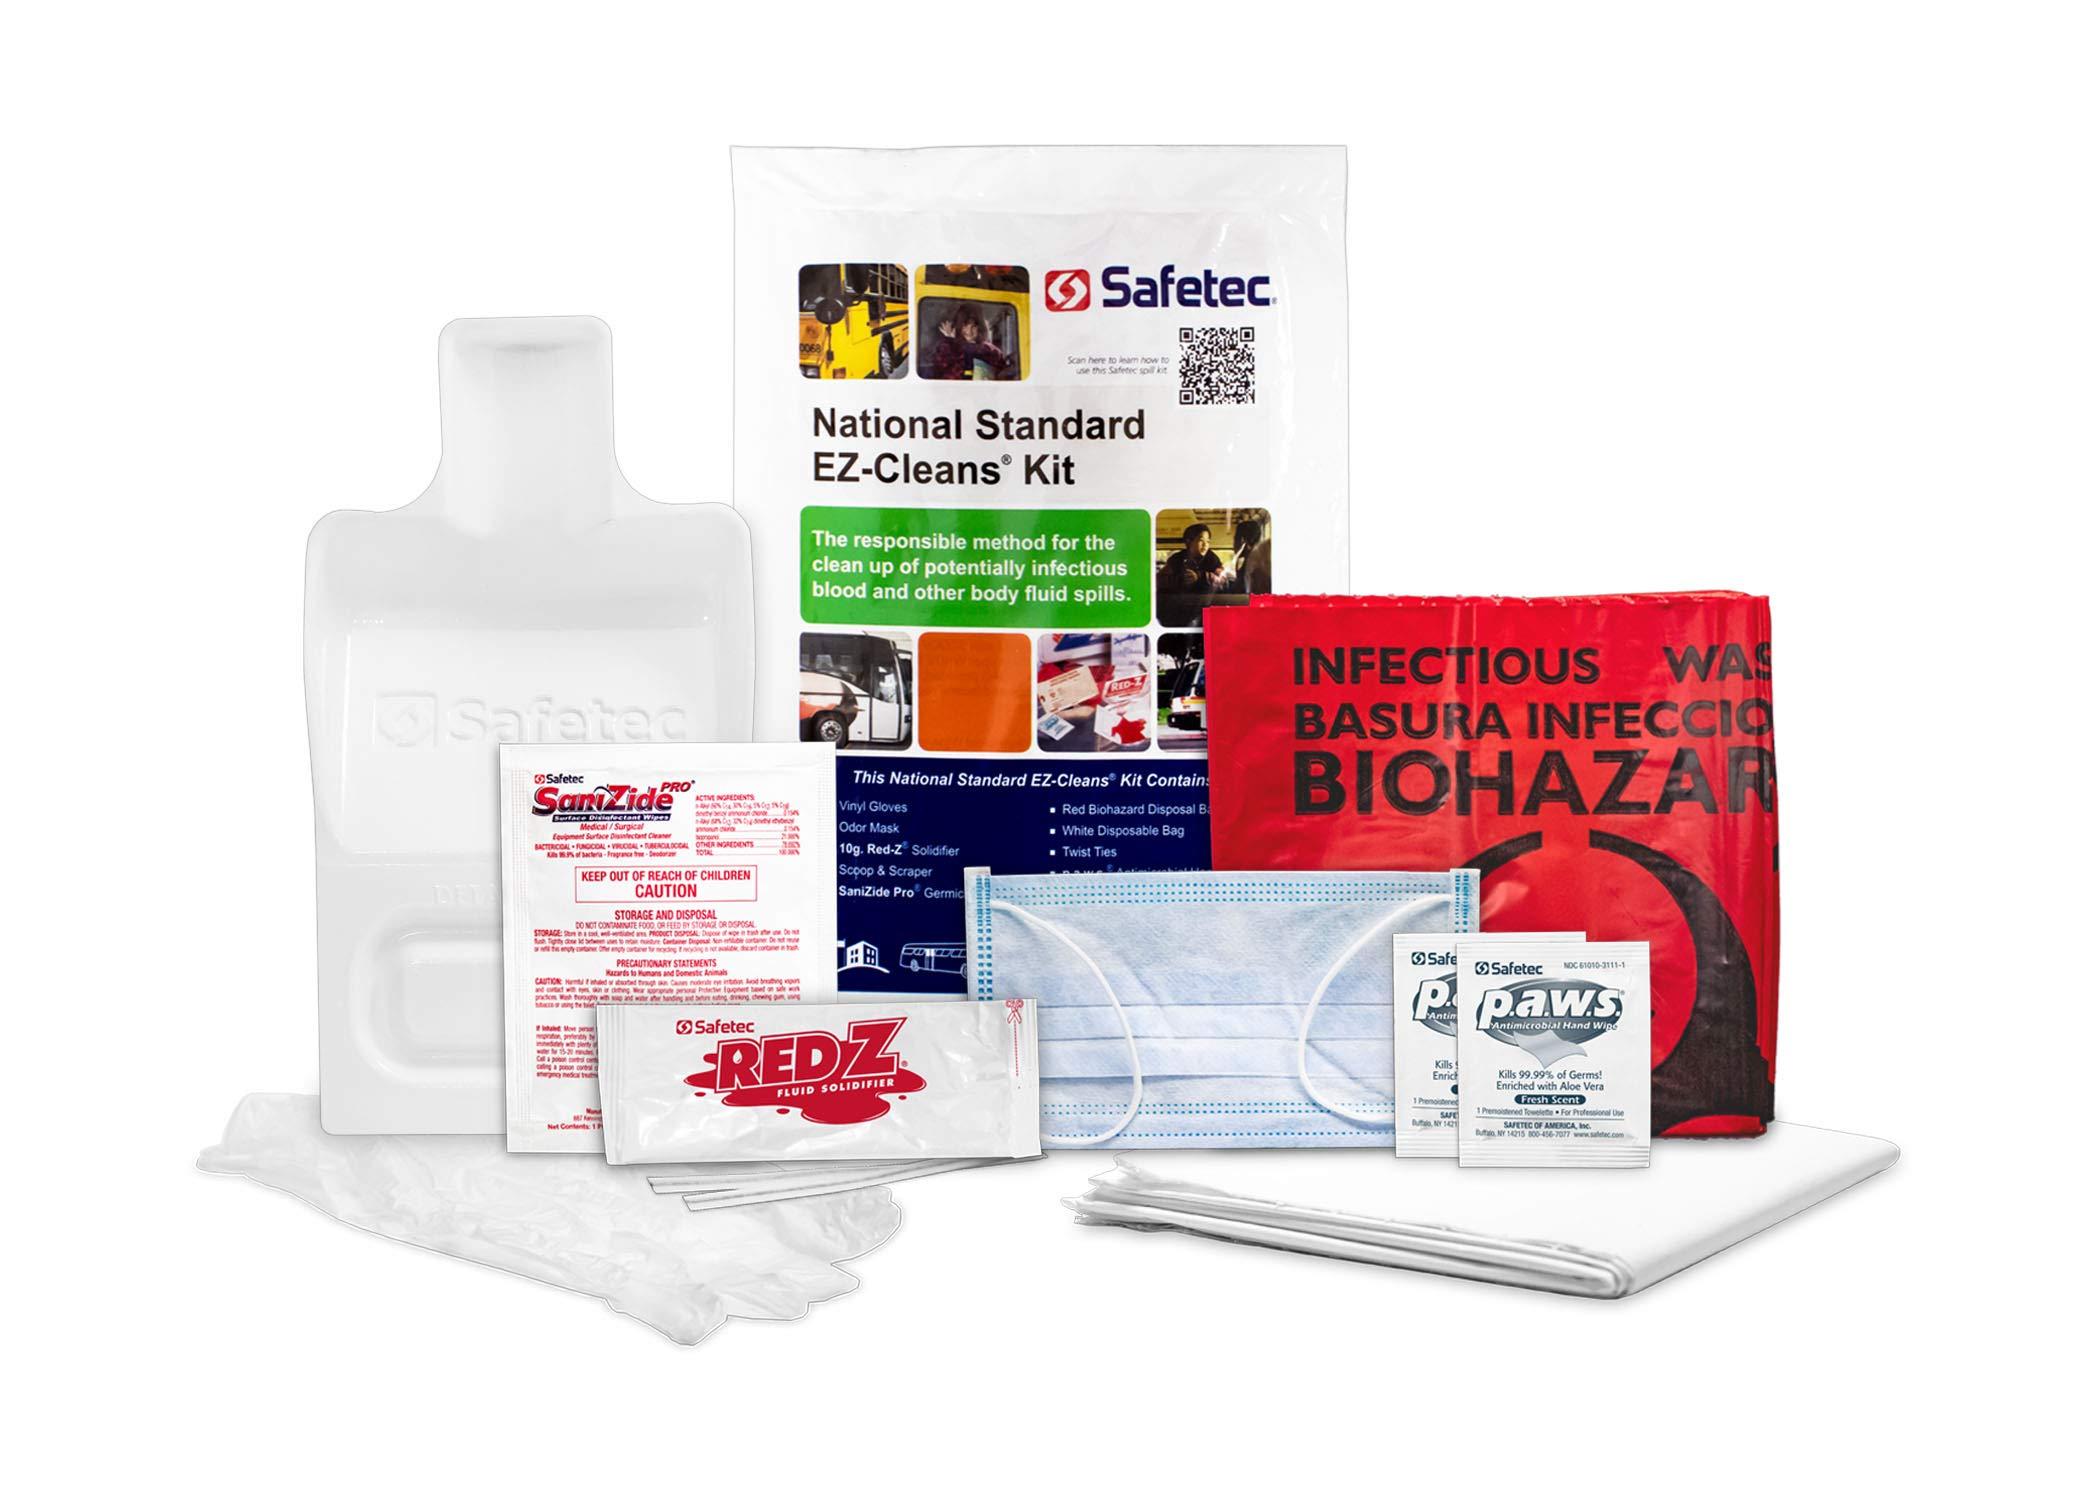 Safetec National Standard EZ-Cleans® Kit (Poly Bag), Body Fluid Spill Kit (24 Kits/case)